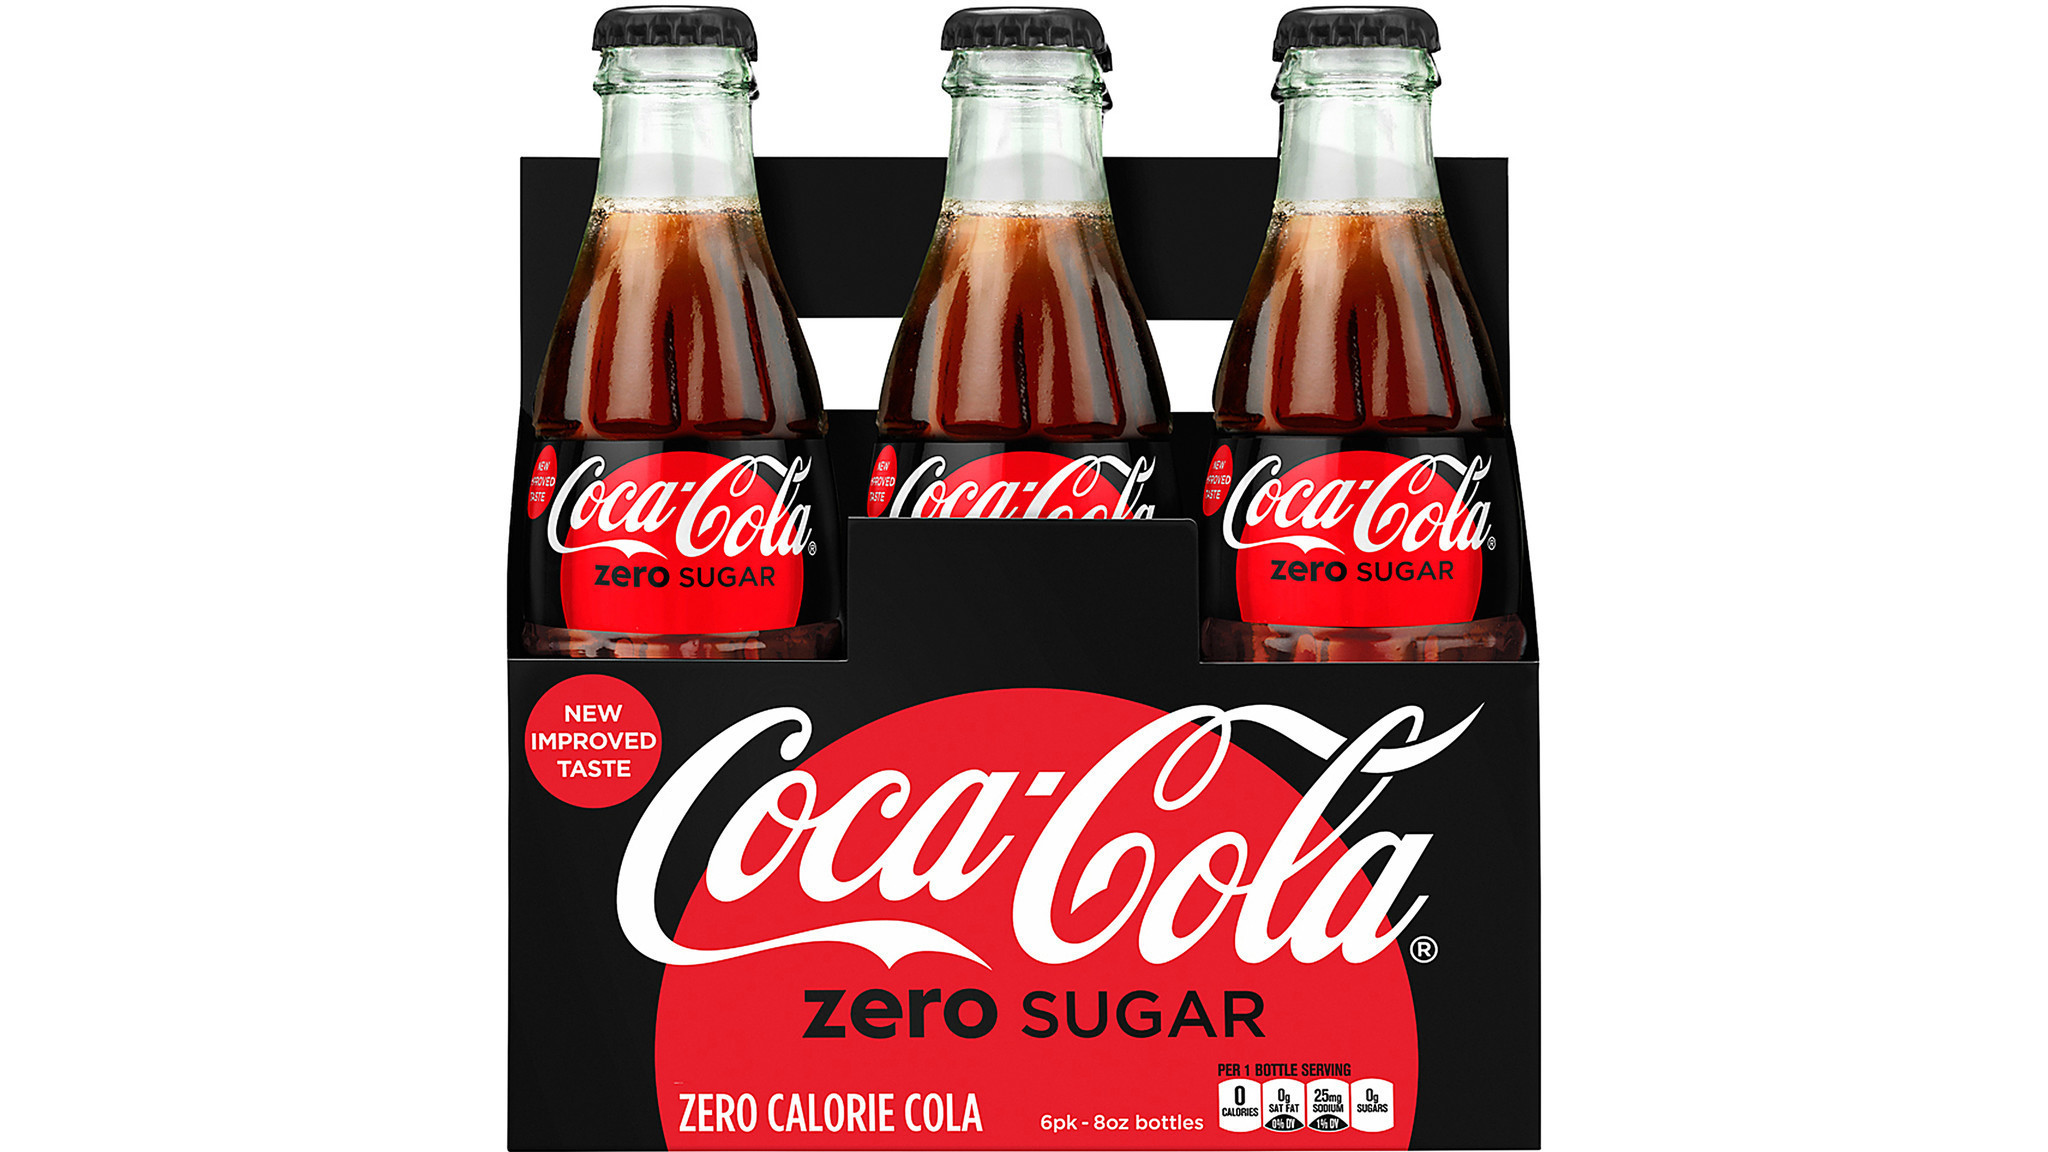 Coke Zero is vanishing. Instead we get Coca-Cola Zero Sugar, with a new recipe